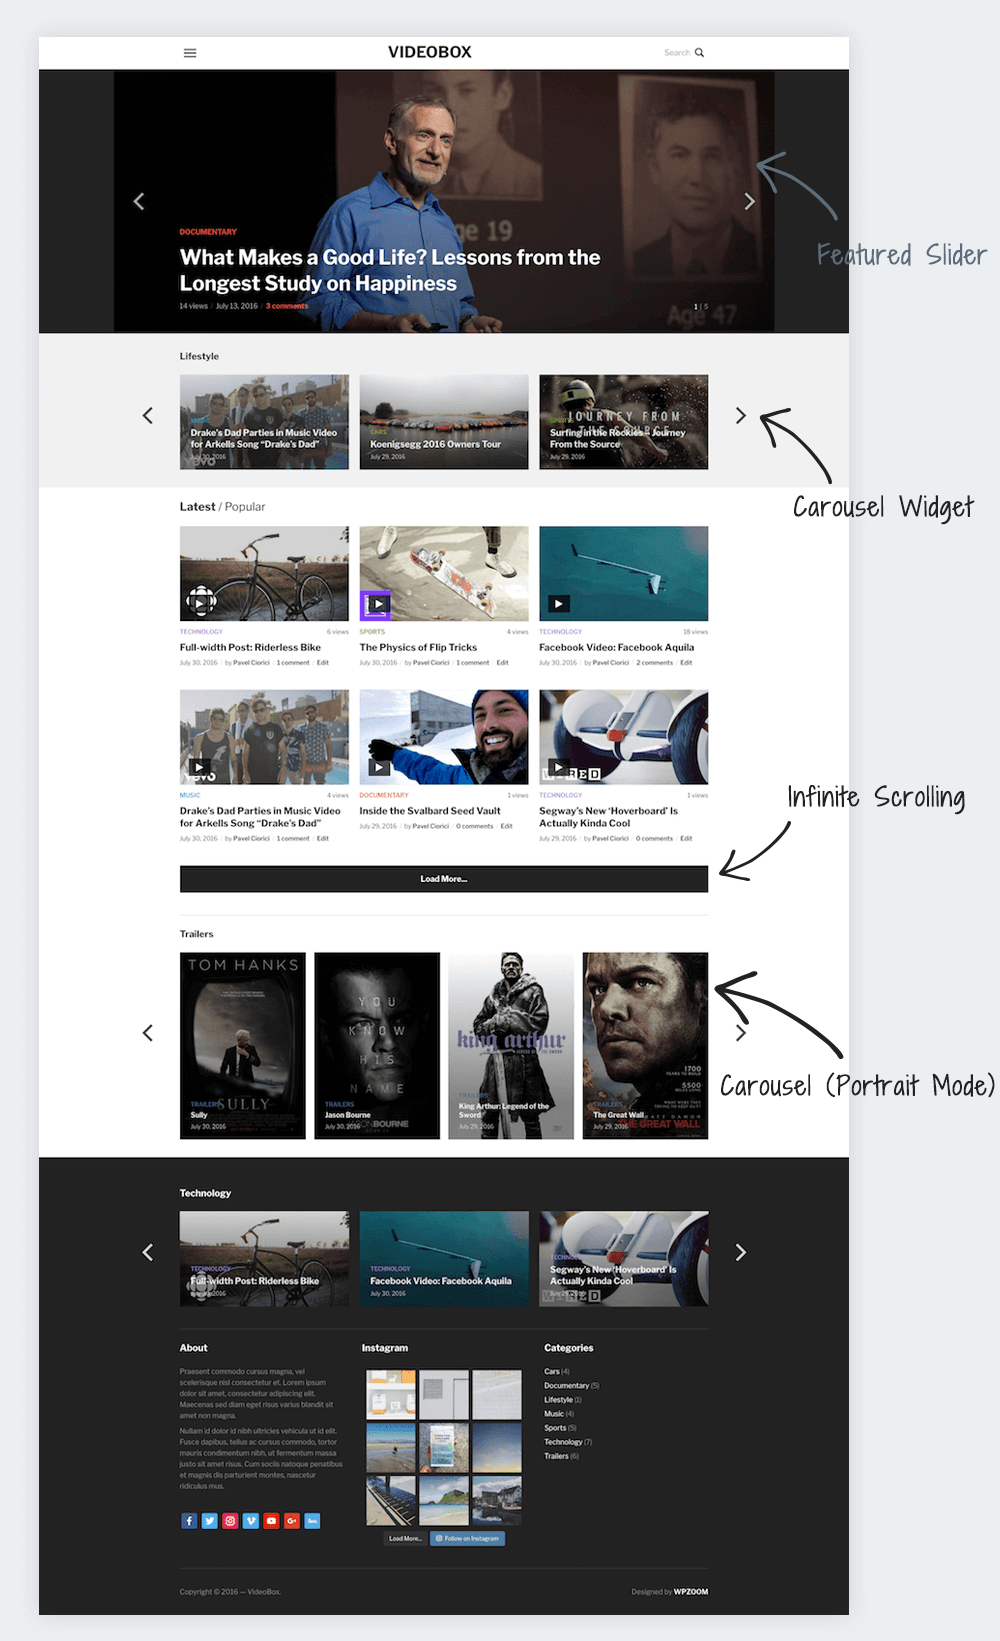 videobox-guide (1)